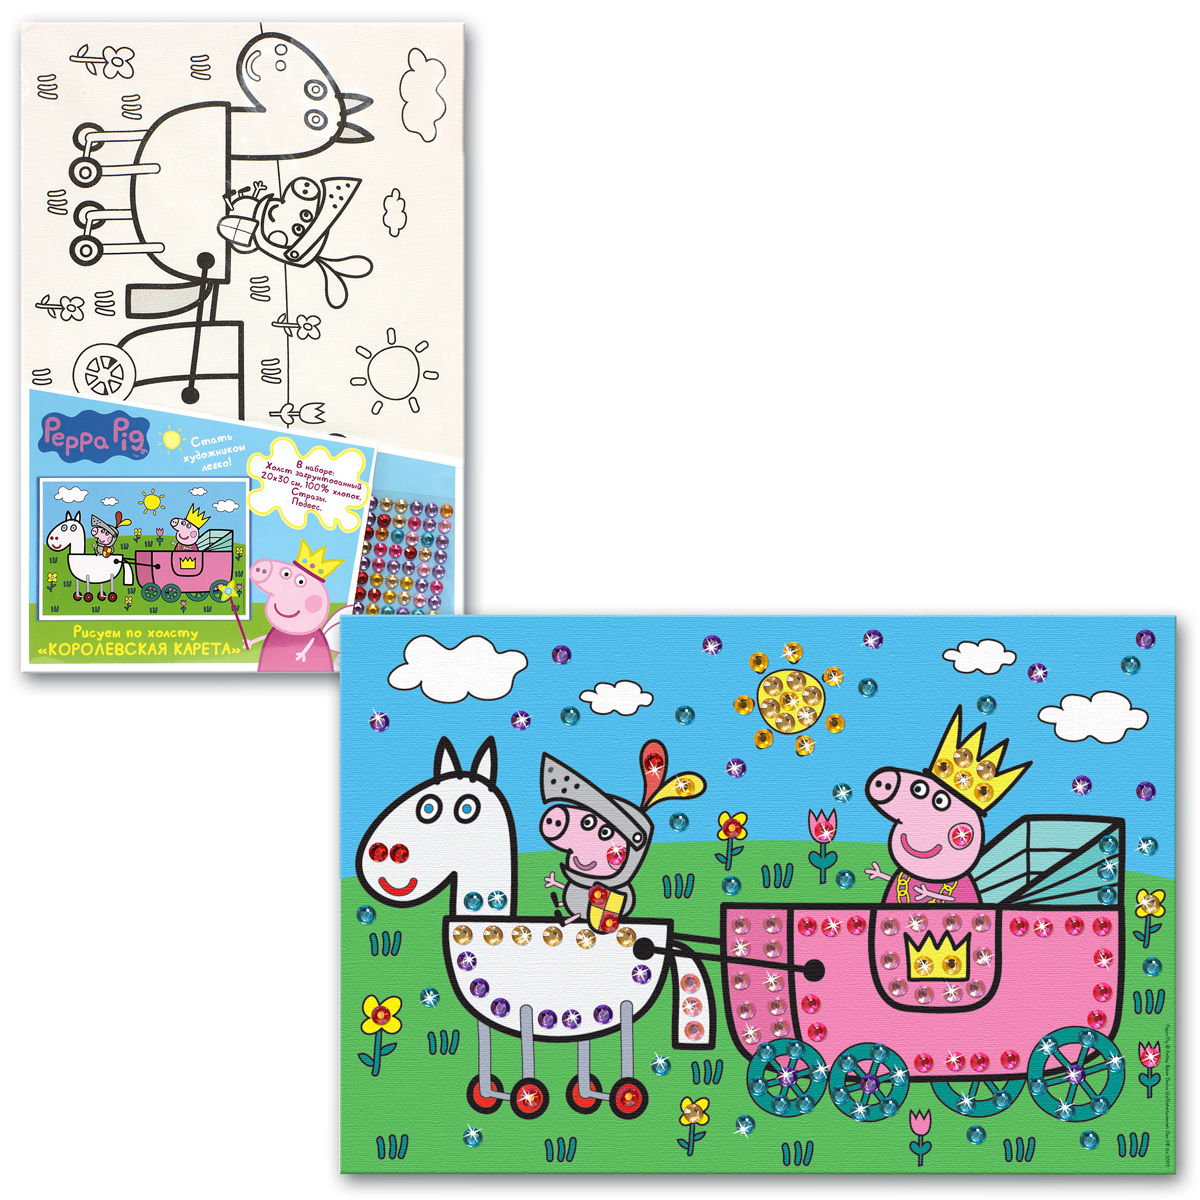 Рисуем по холсту Peppa - Королевская карета, со стразами, 20 х 30Свинка Пеппа Peppa Pig<br>Рисуем по холсту Peppa - Королевская карета, со стразами, 20 х 30<br>